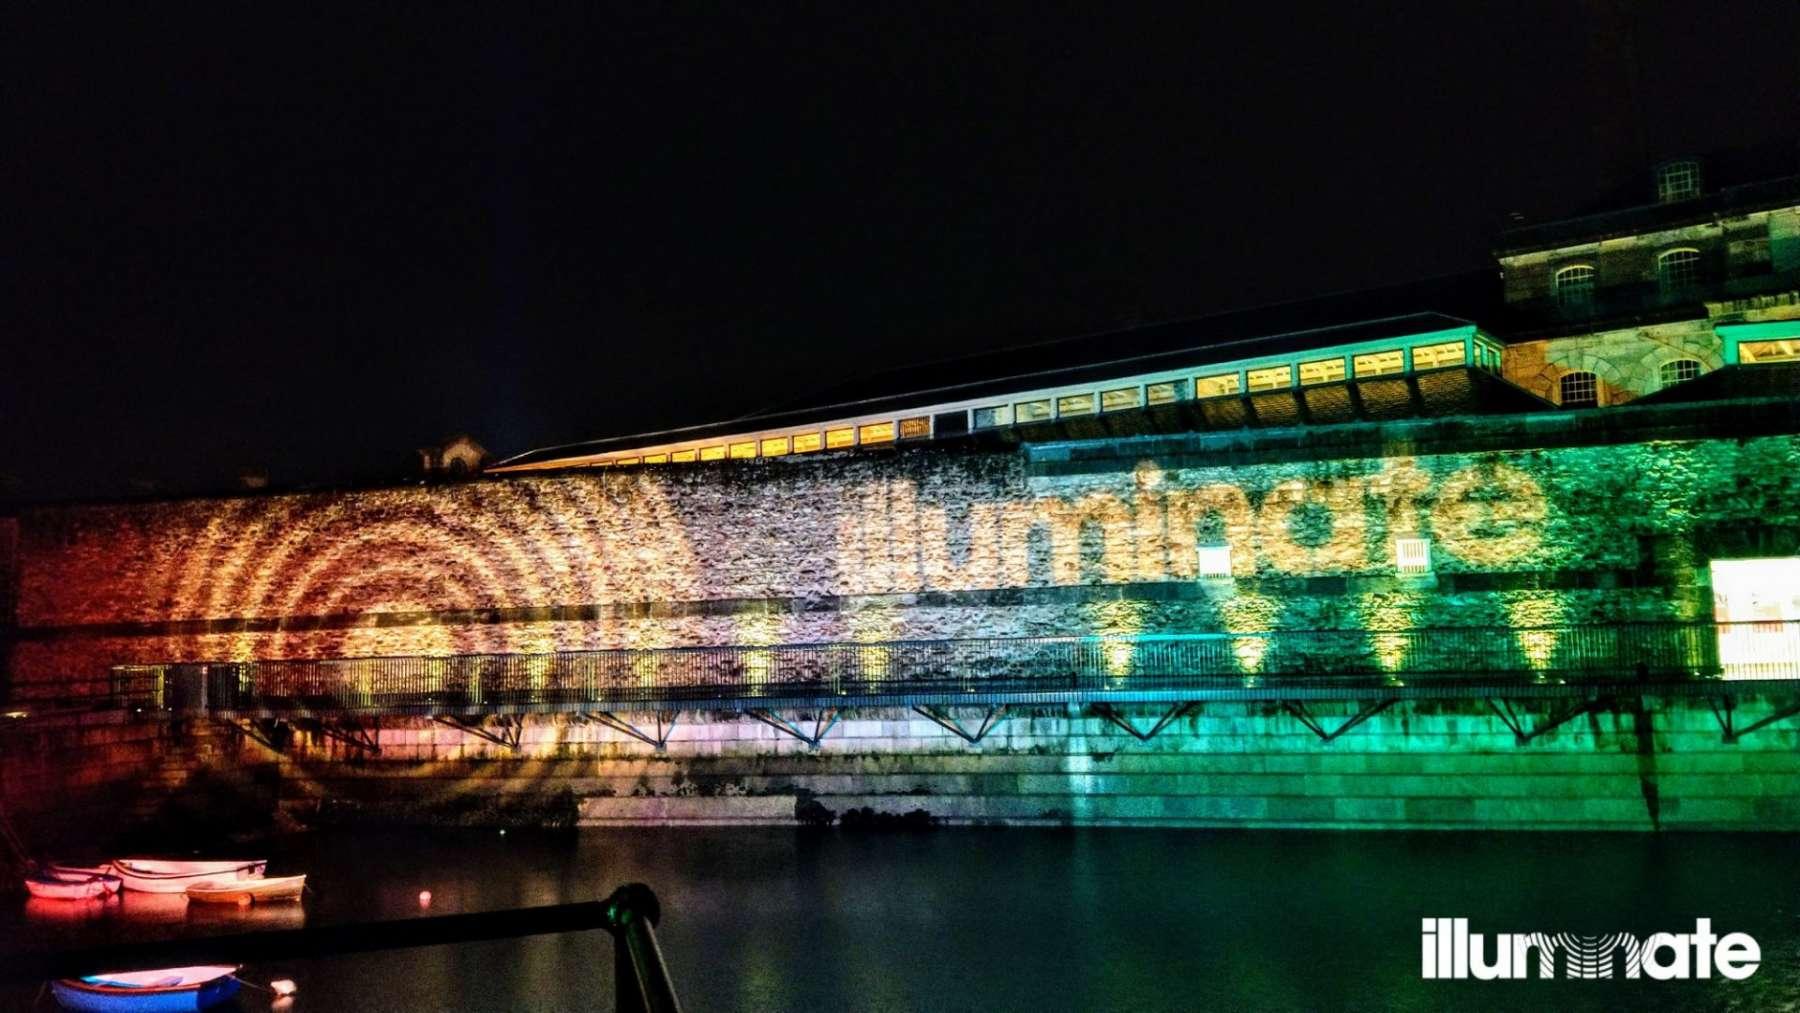 Illuminate logo projected onto uplit exterior wall